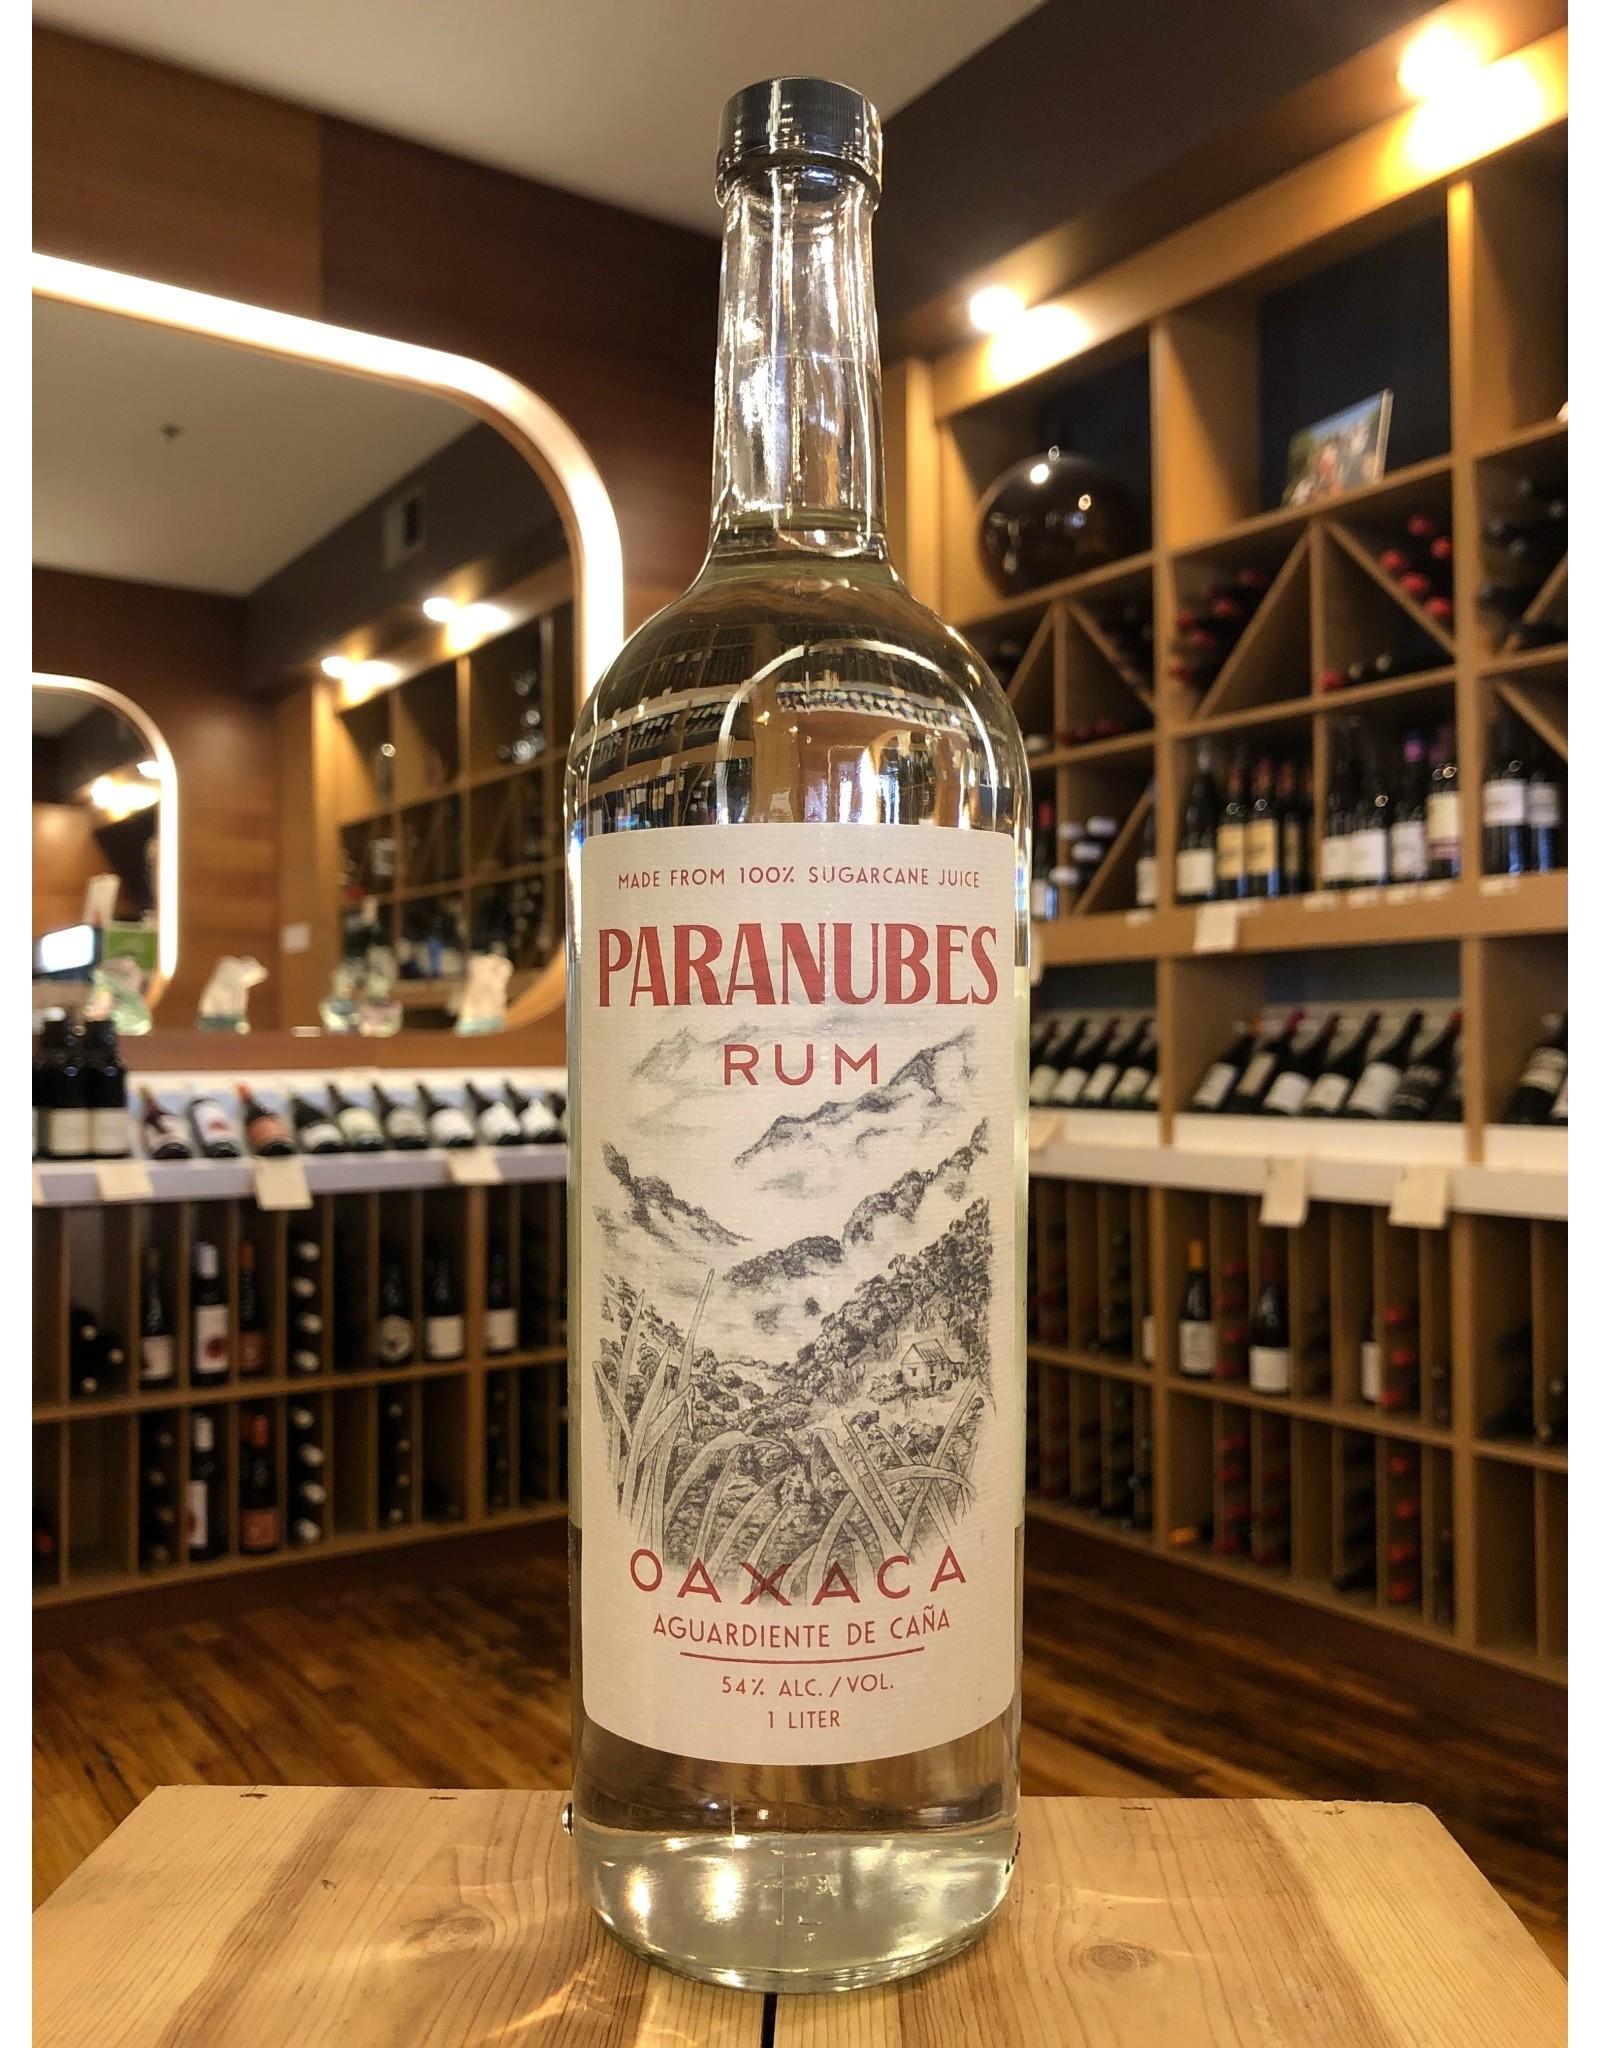 Paranubes Oaxaca Aguardiente - 1 Liter